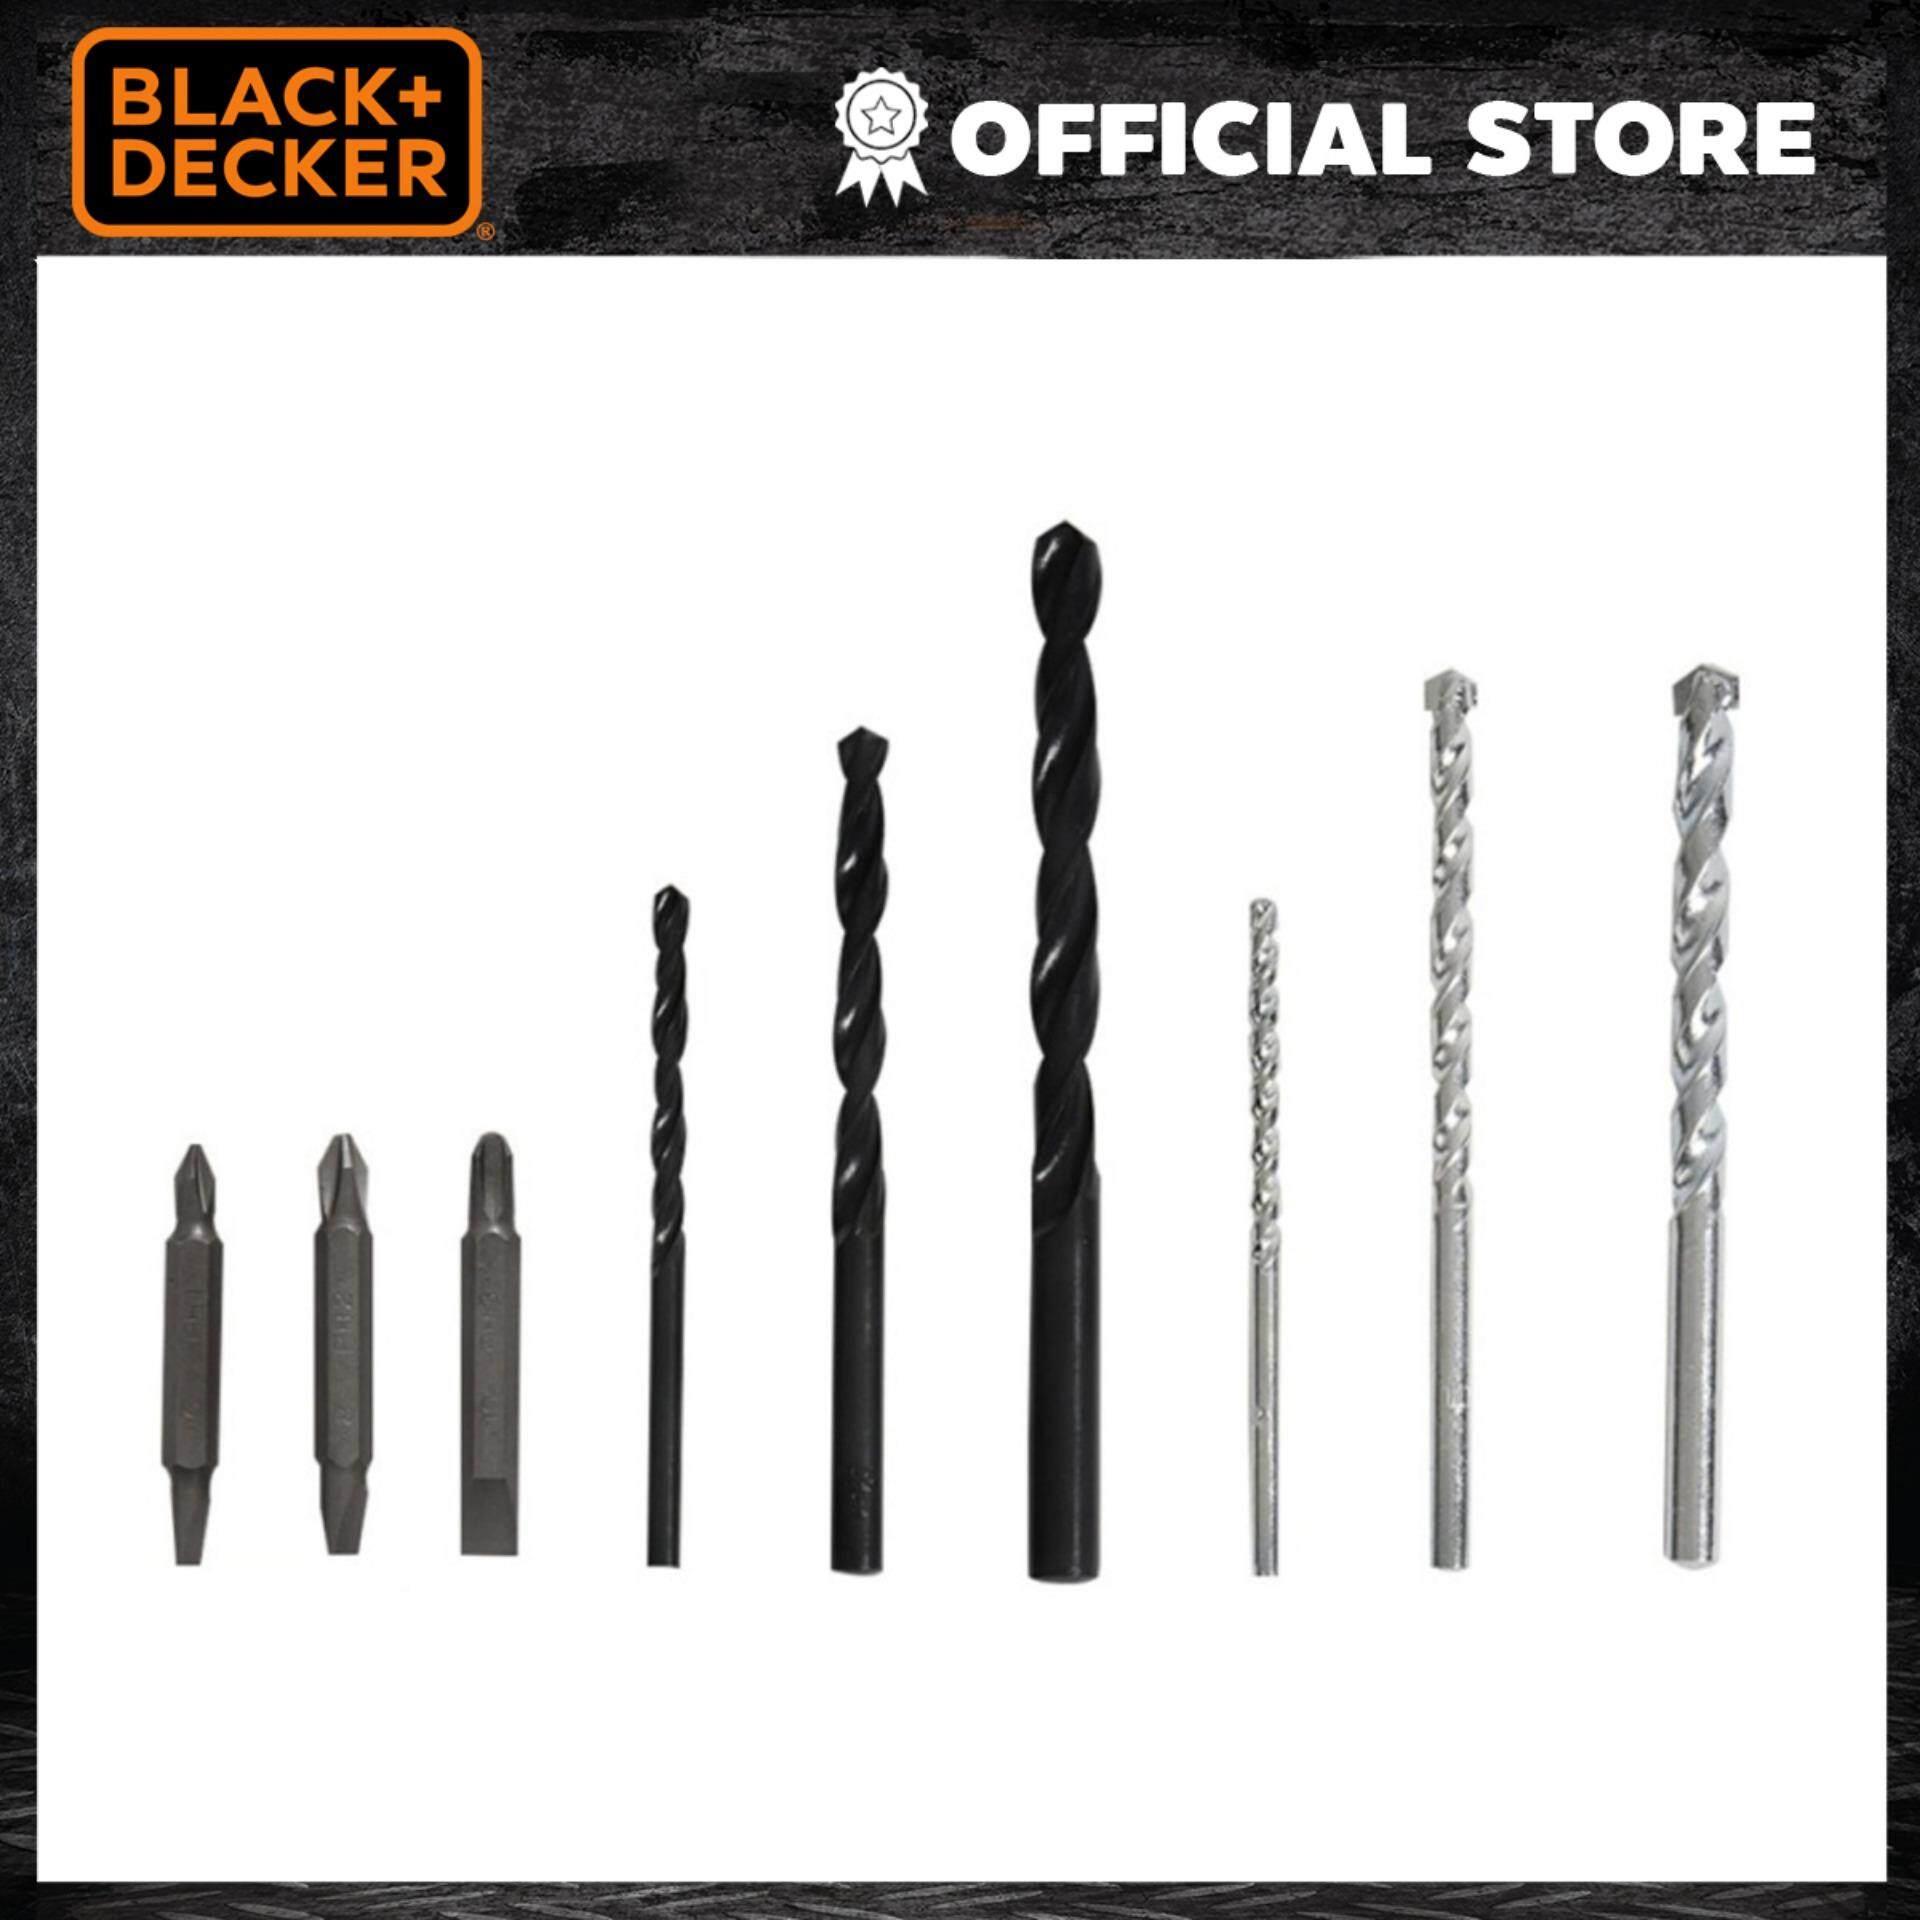 Black&Decker ชุดดอกสว่าน 9ชิ้น รุ่น 50688G